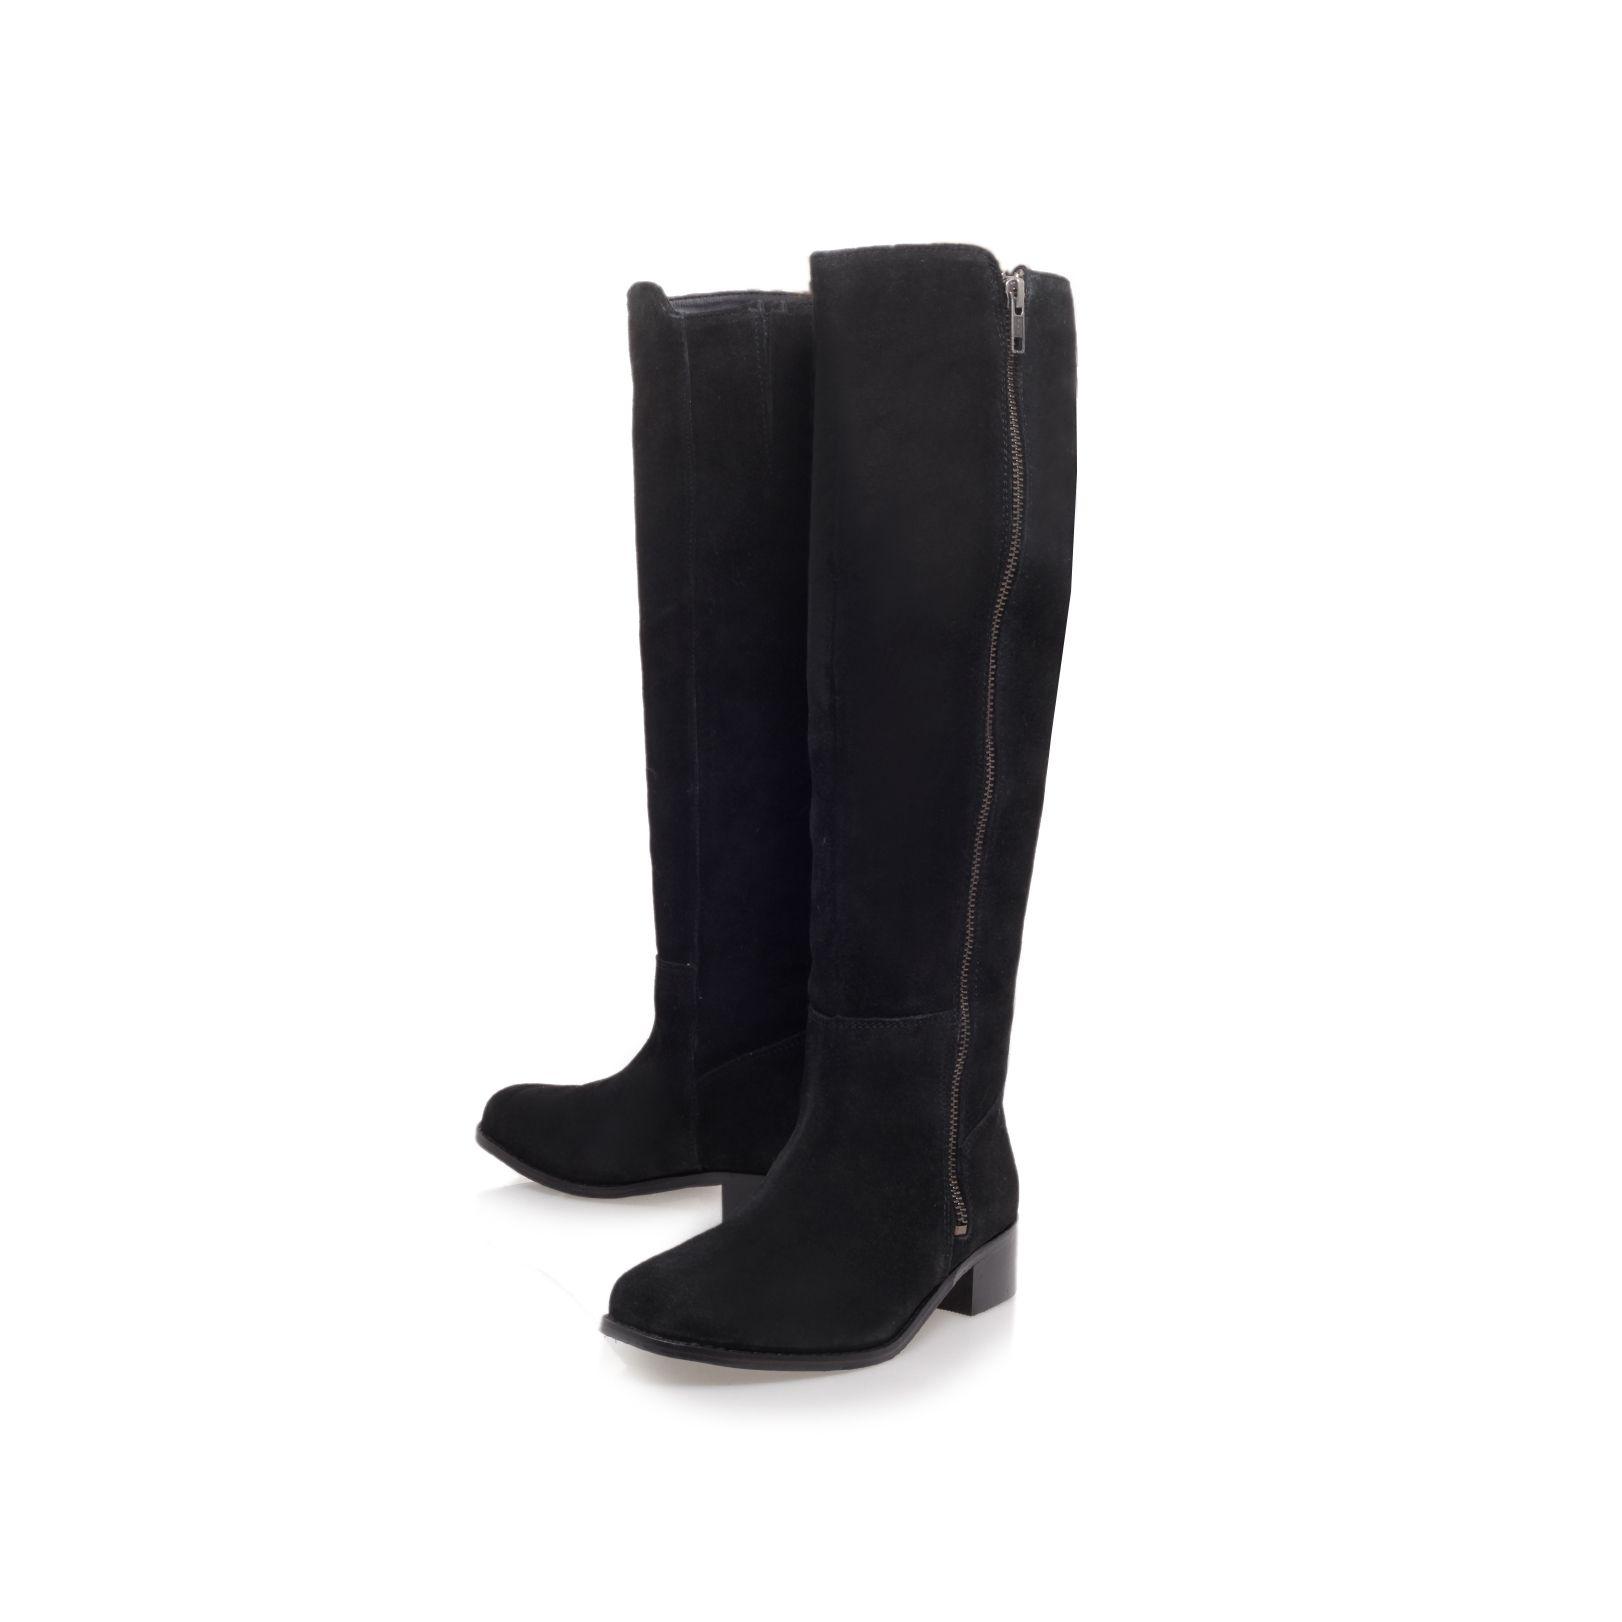 Carvela Kurt Geiger Paris Low Heeled Knee Length Boots in Black Suede (Black)